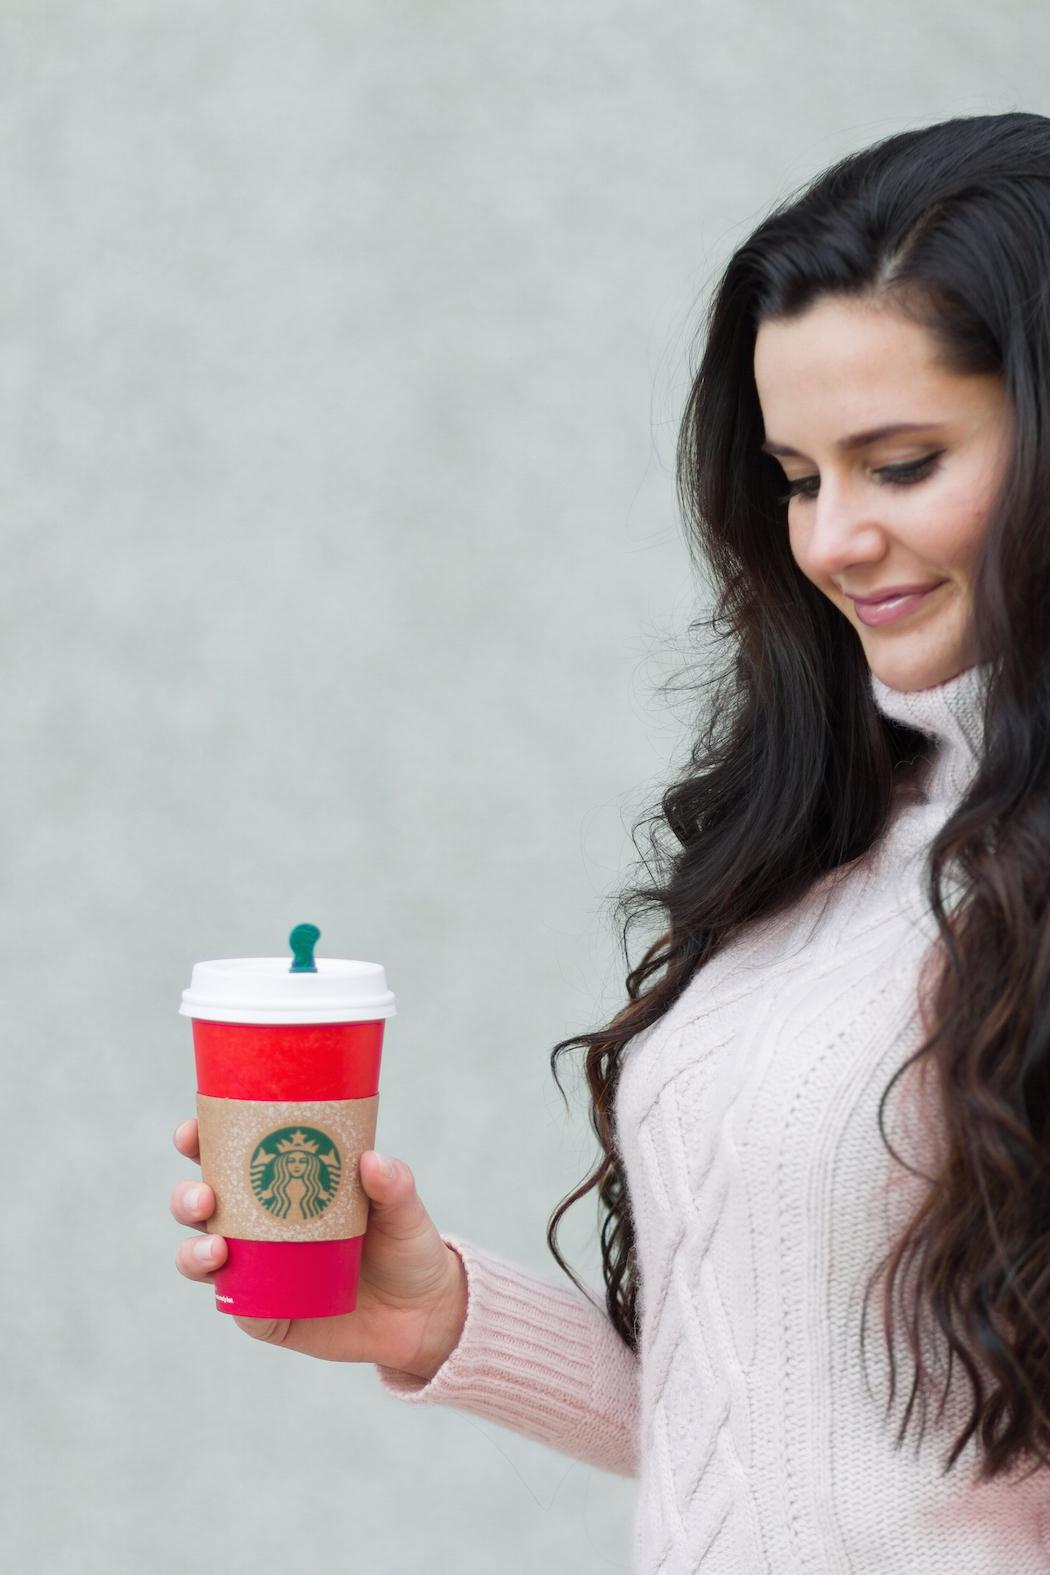 warm drink + cozy sweater